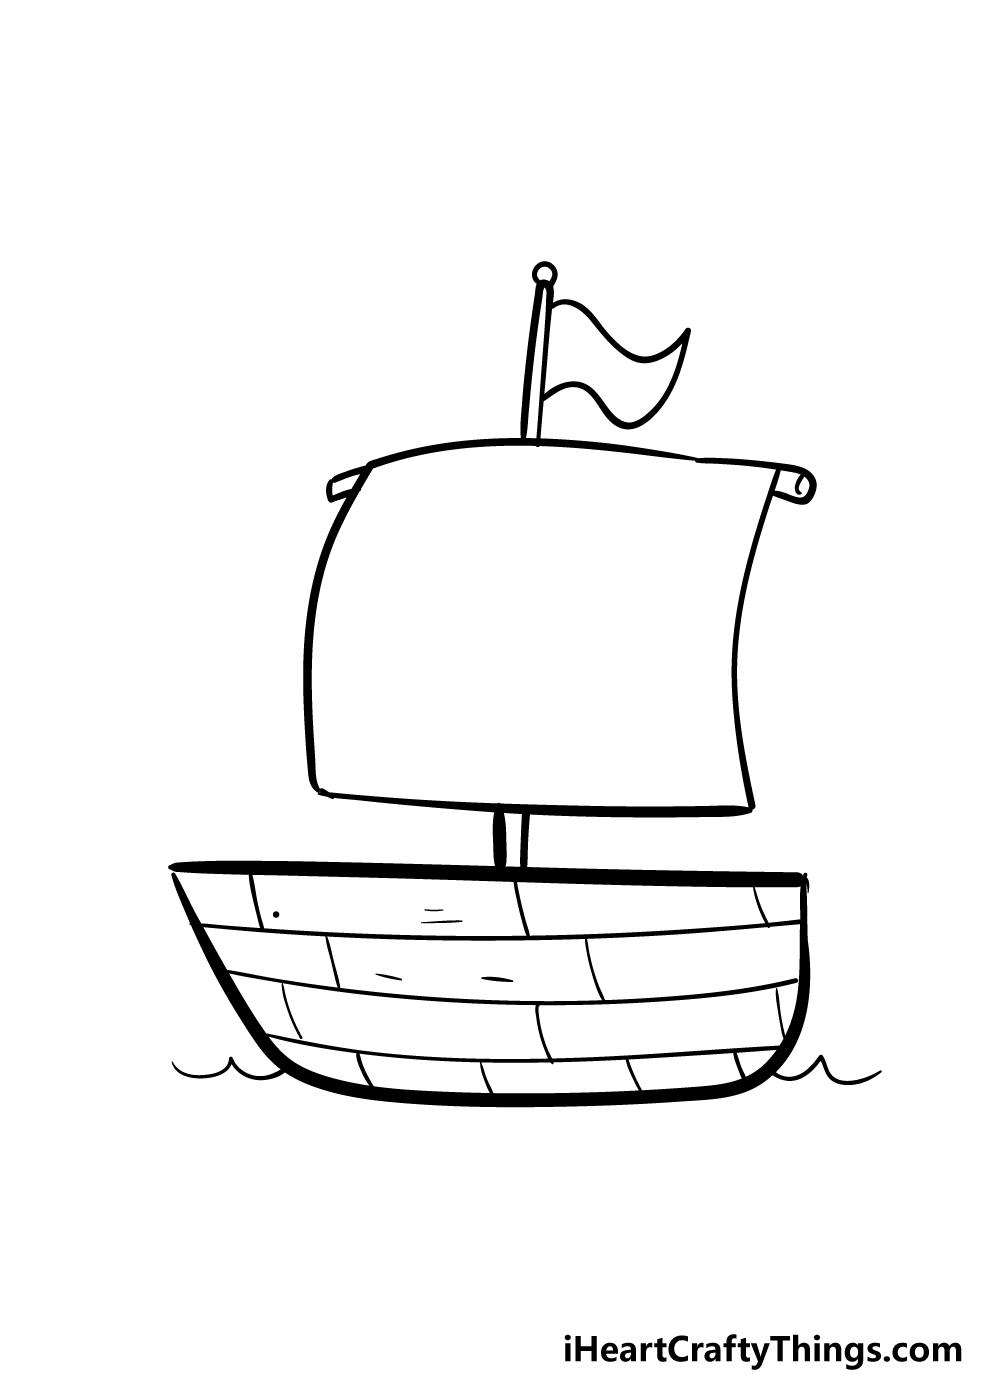 boat drawing step 6